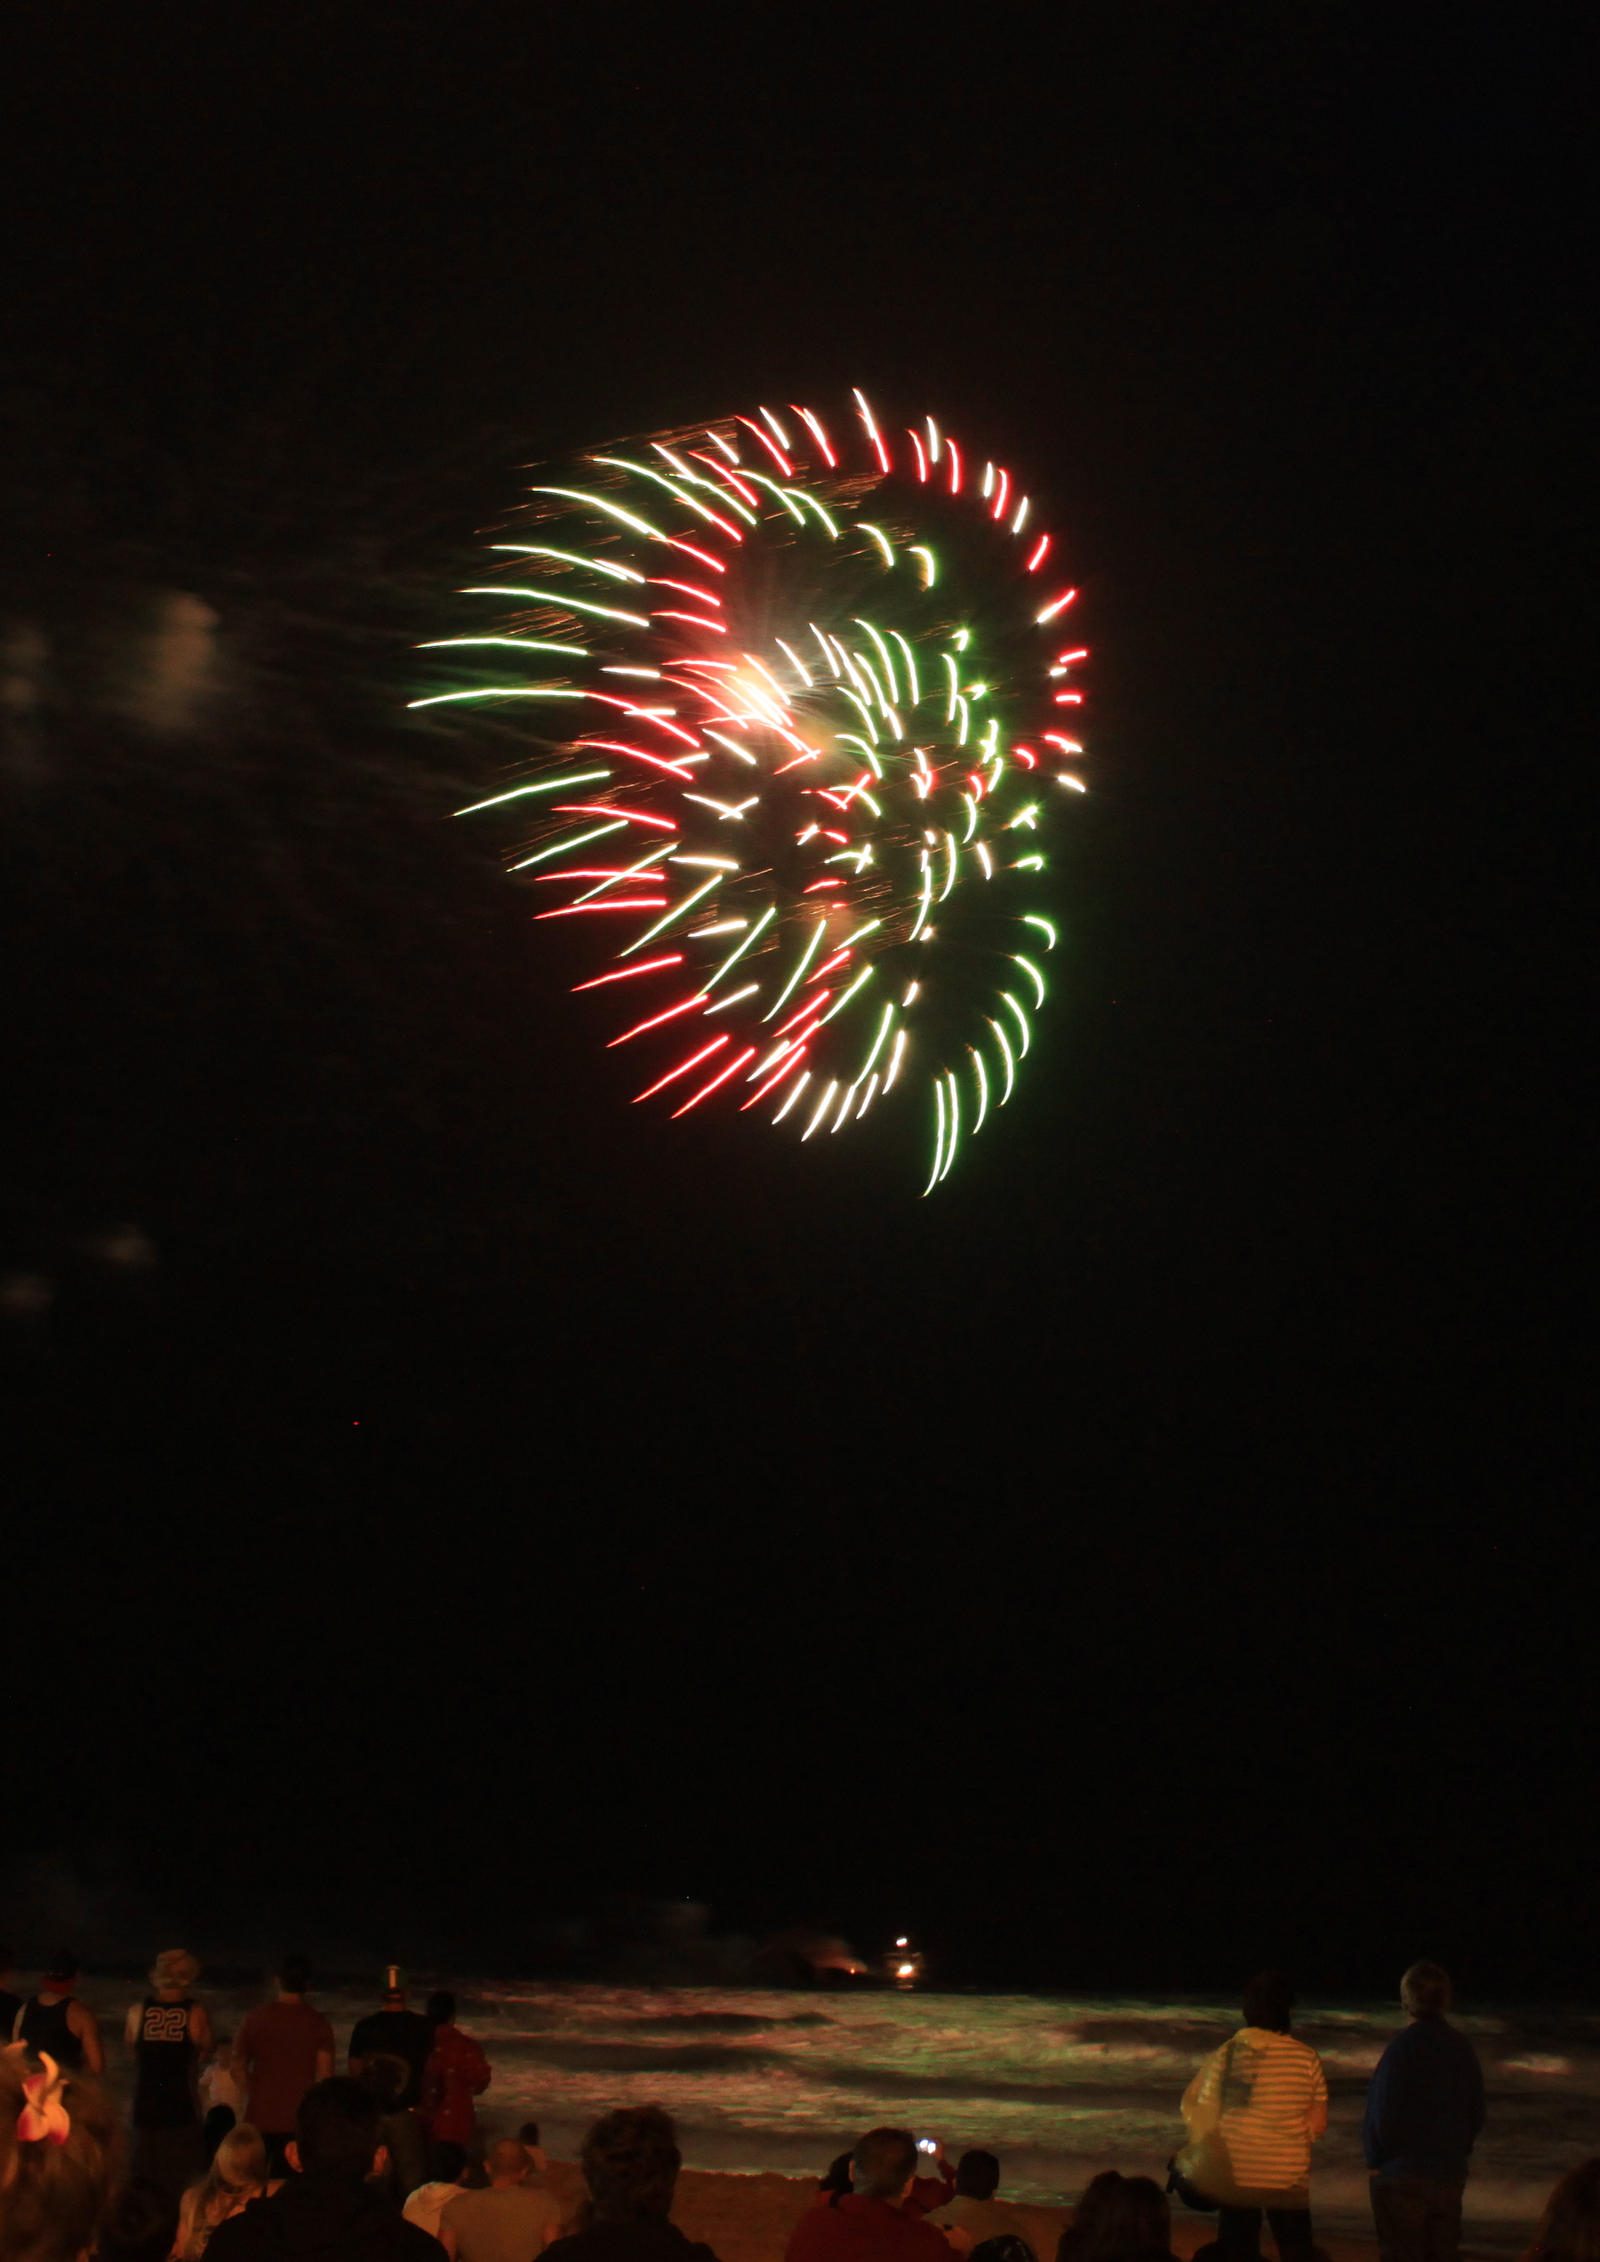 NYE 2013 Fireworks by TarJakArt